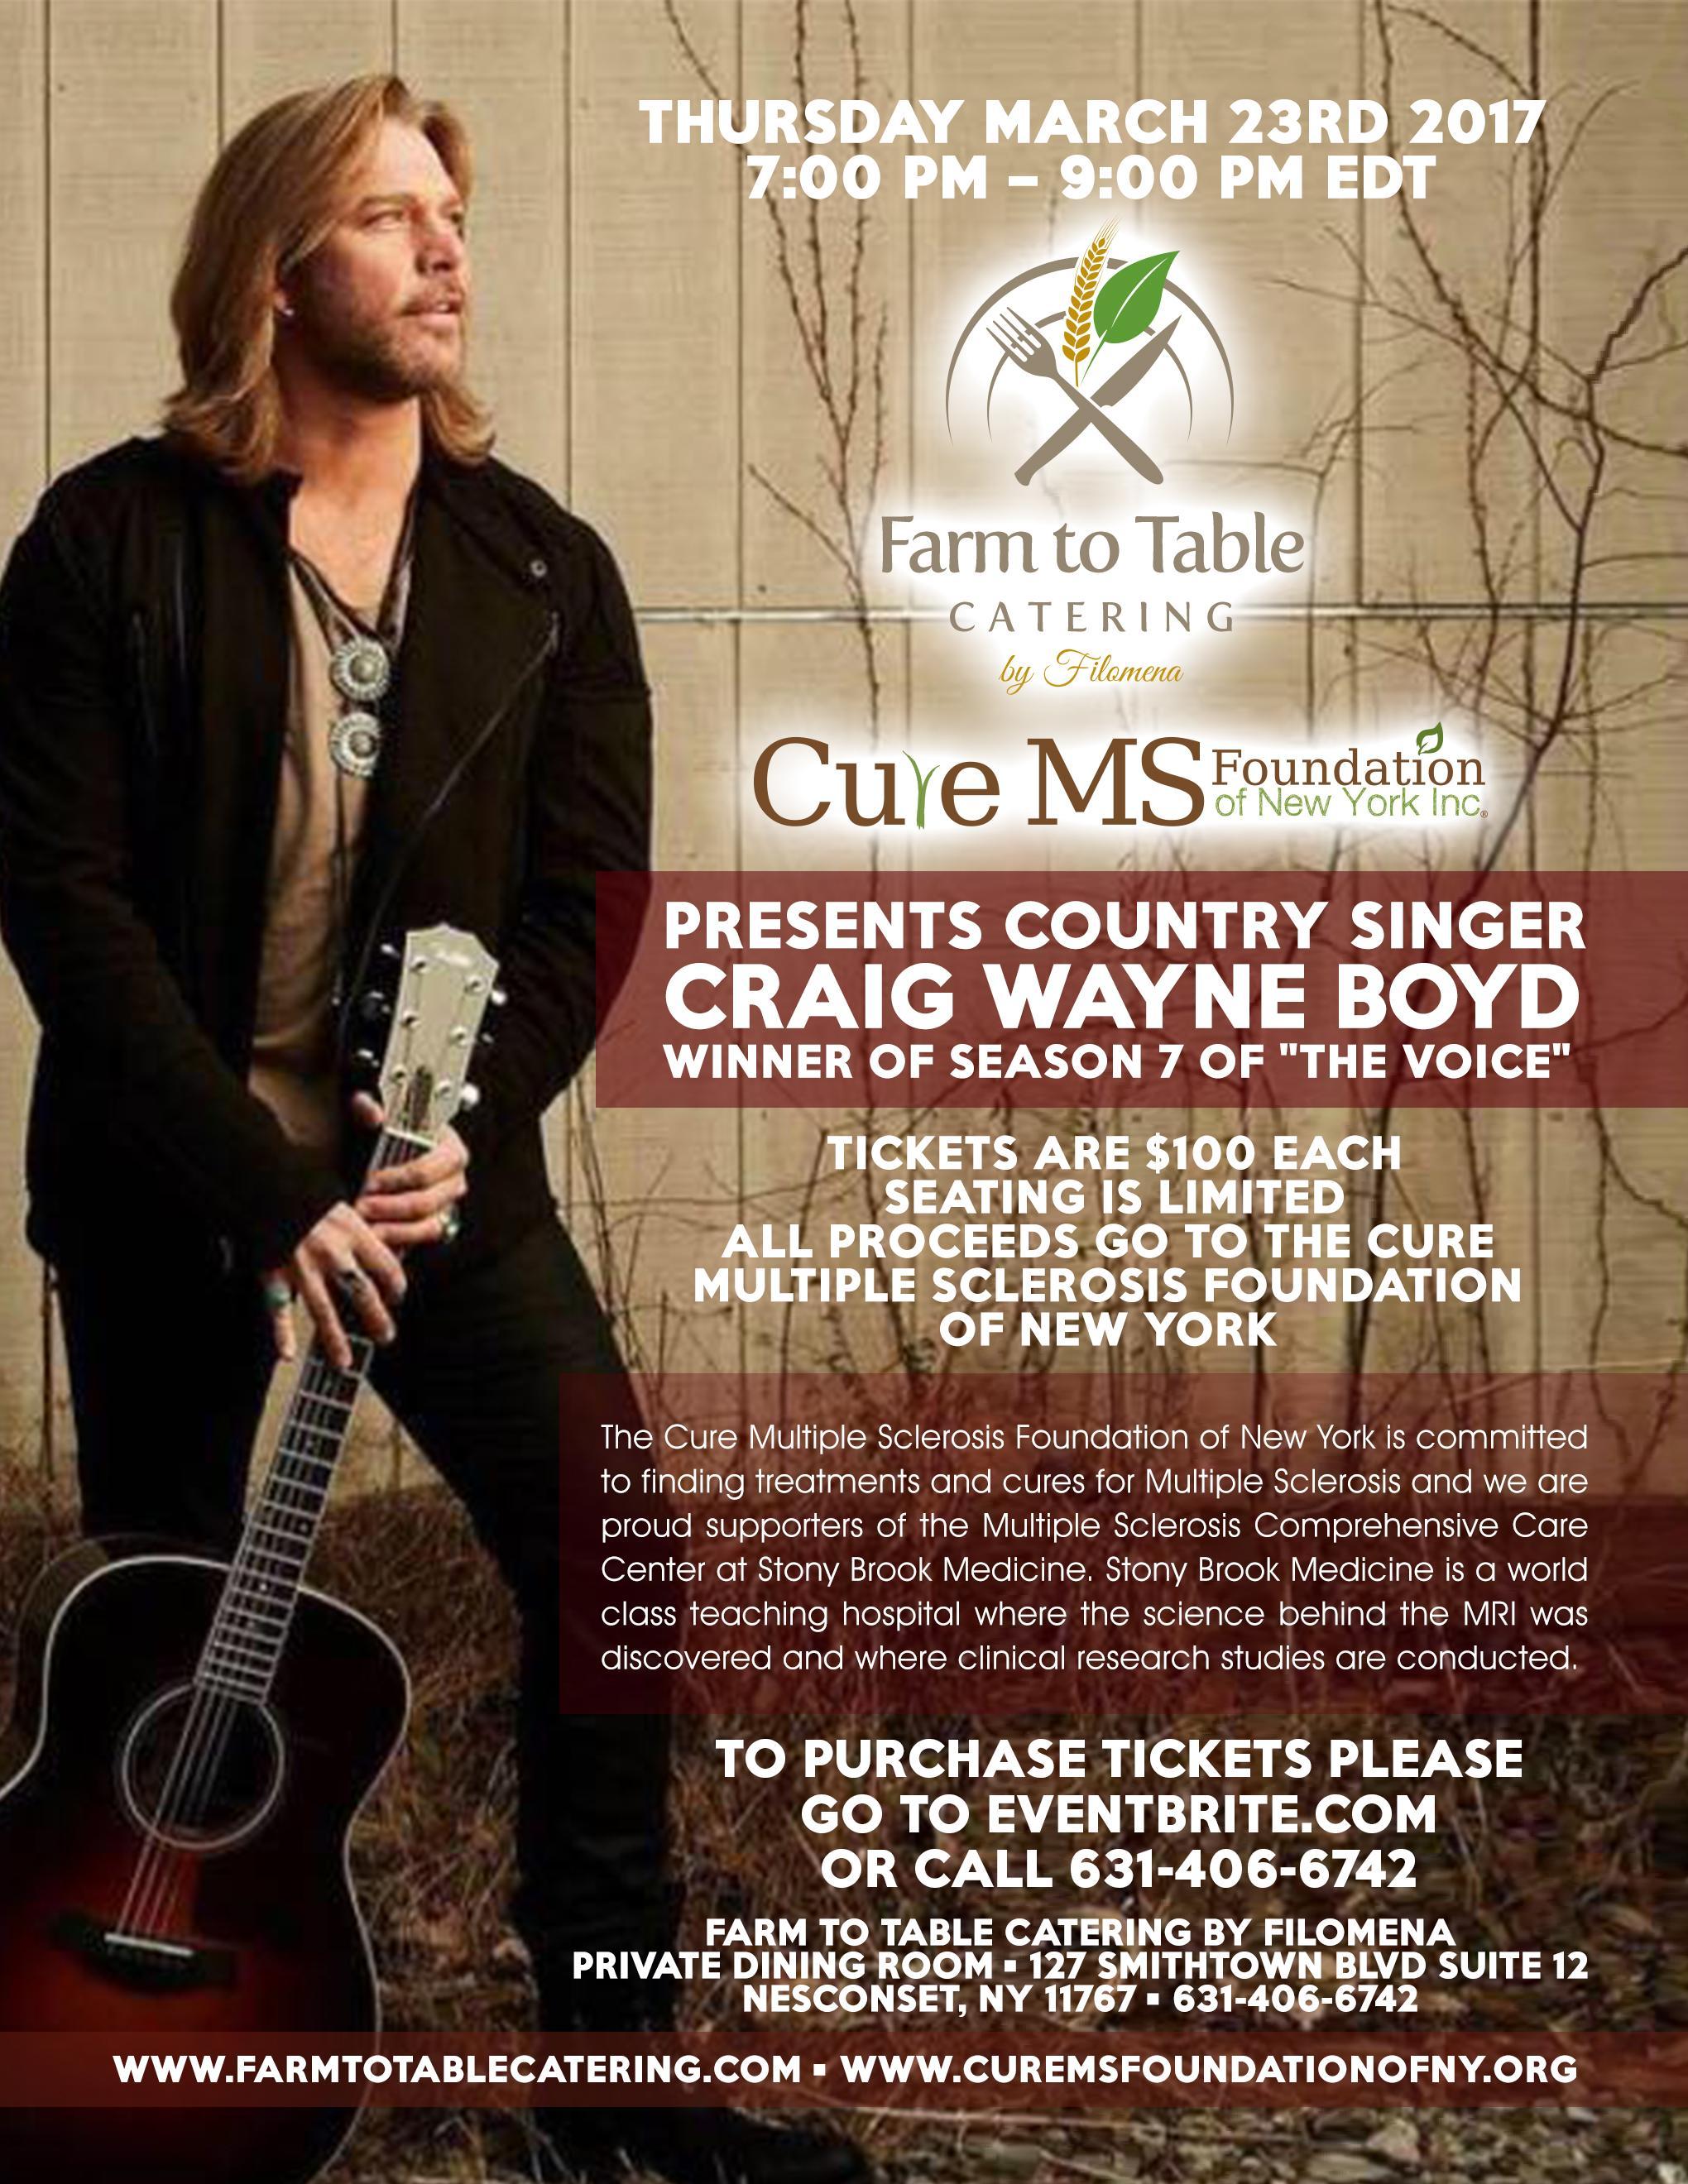 Meet Craig Wayne Boyd and Help Cure Multiple